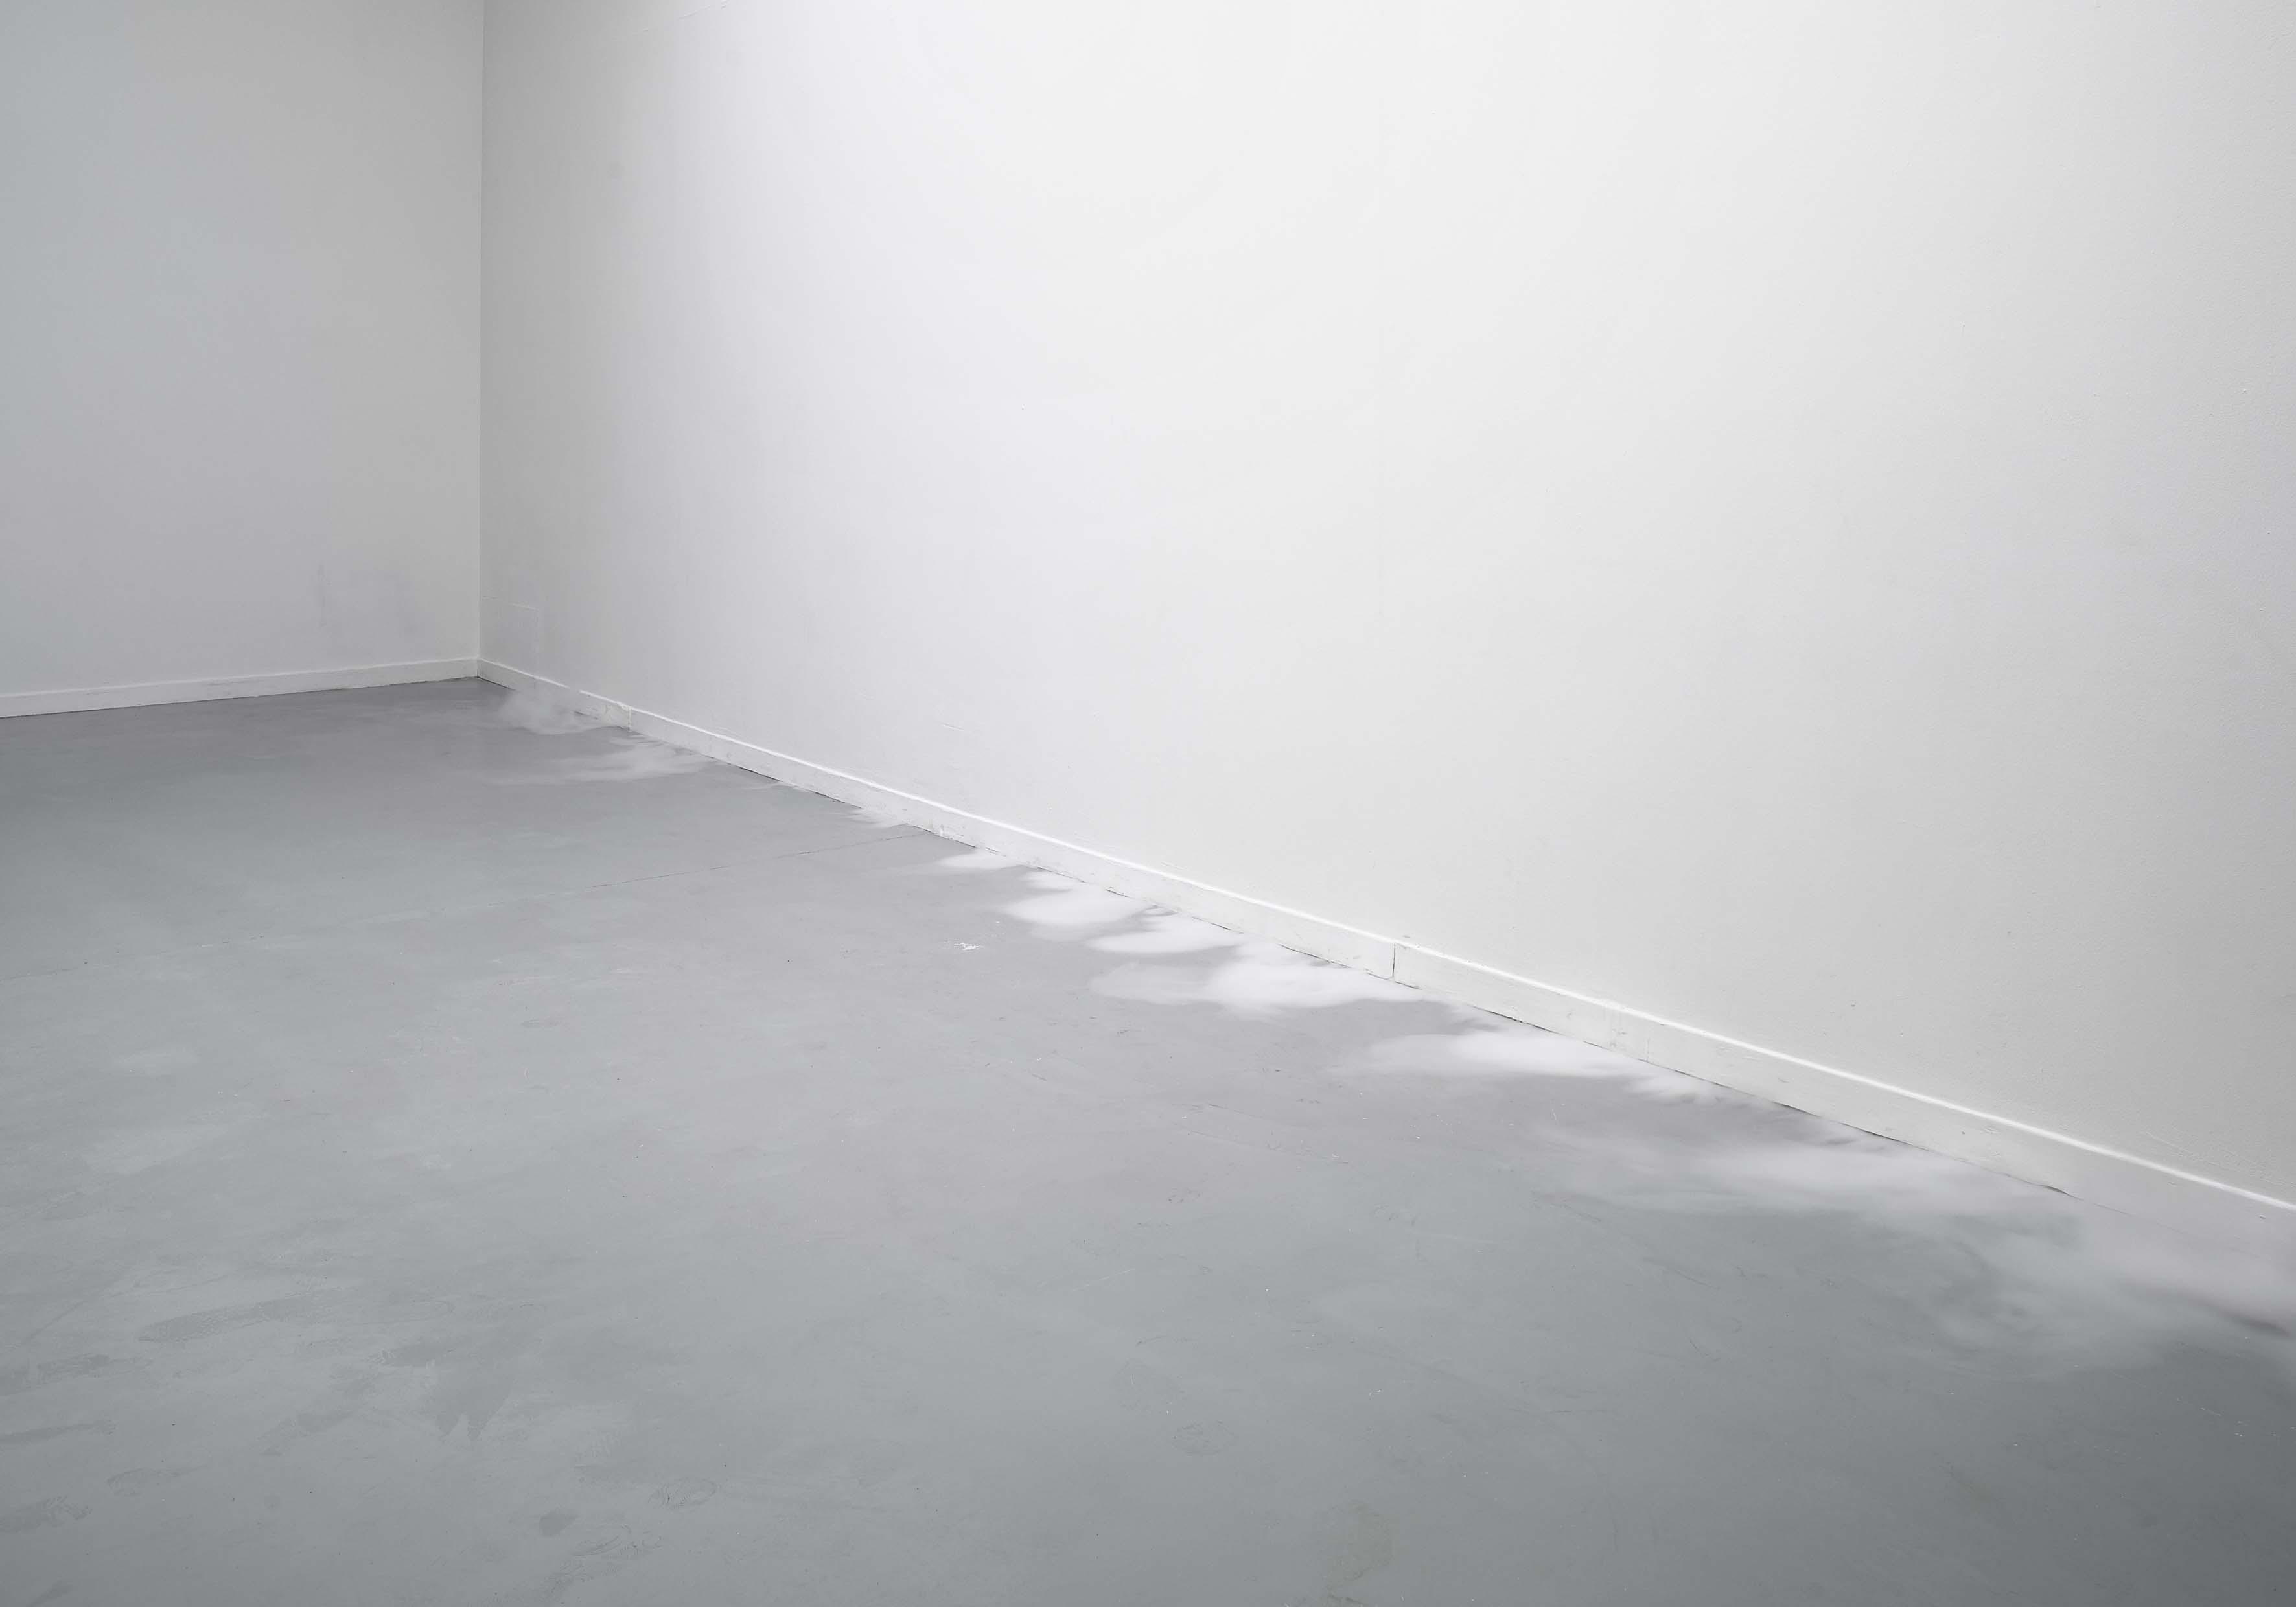 Landscape, 2004 |  | ProjecteSD